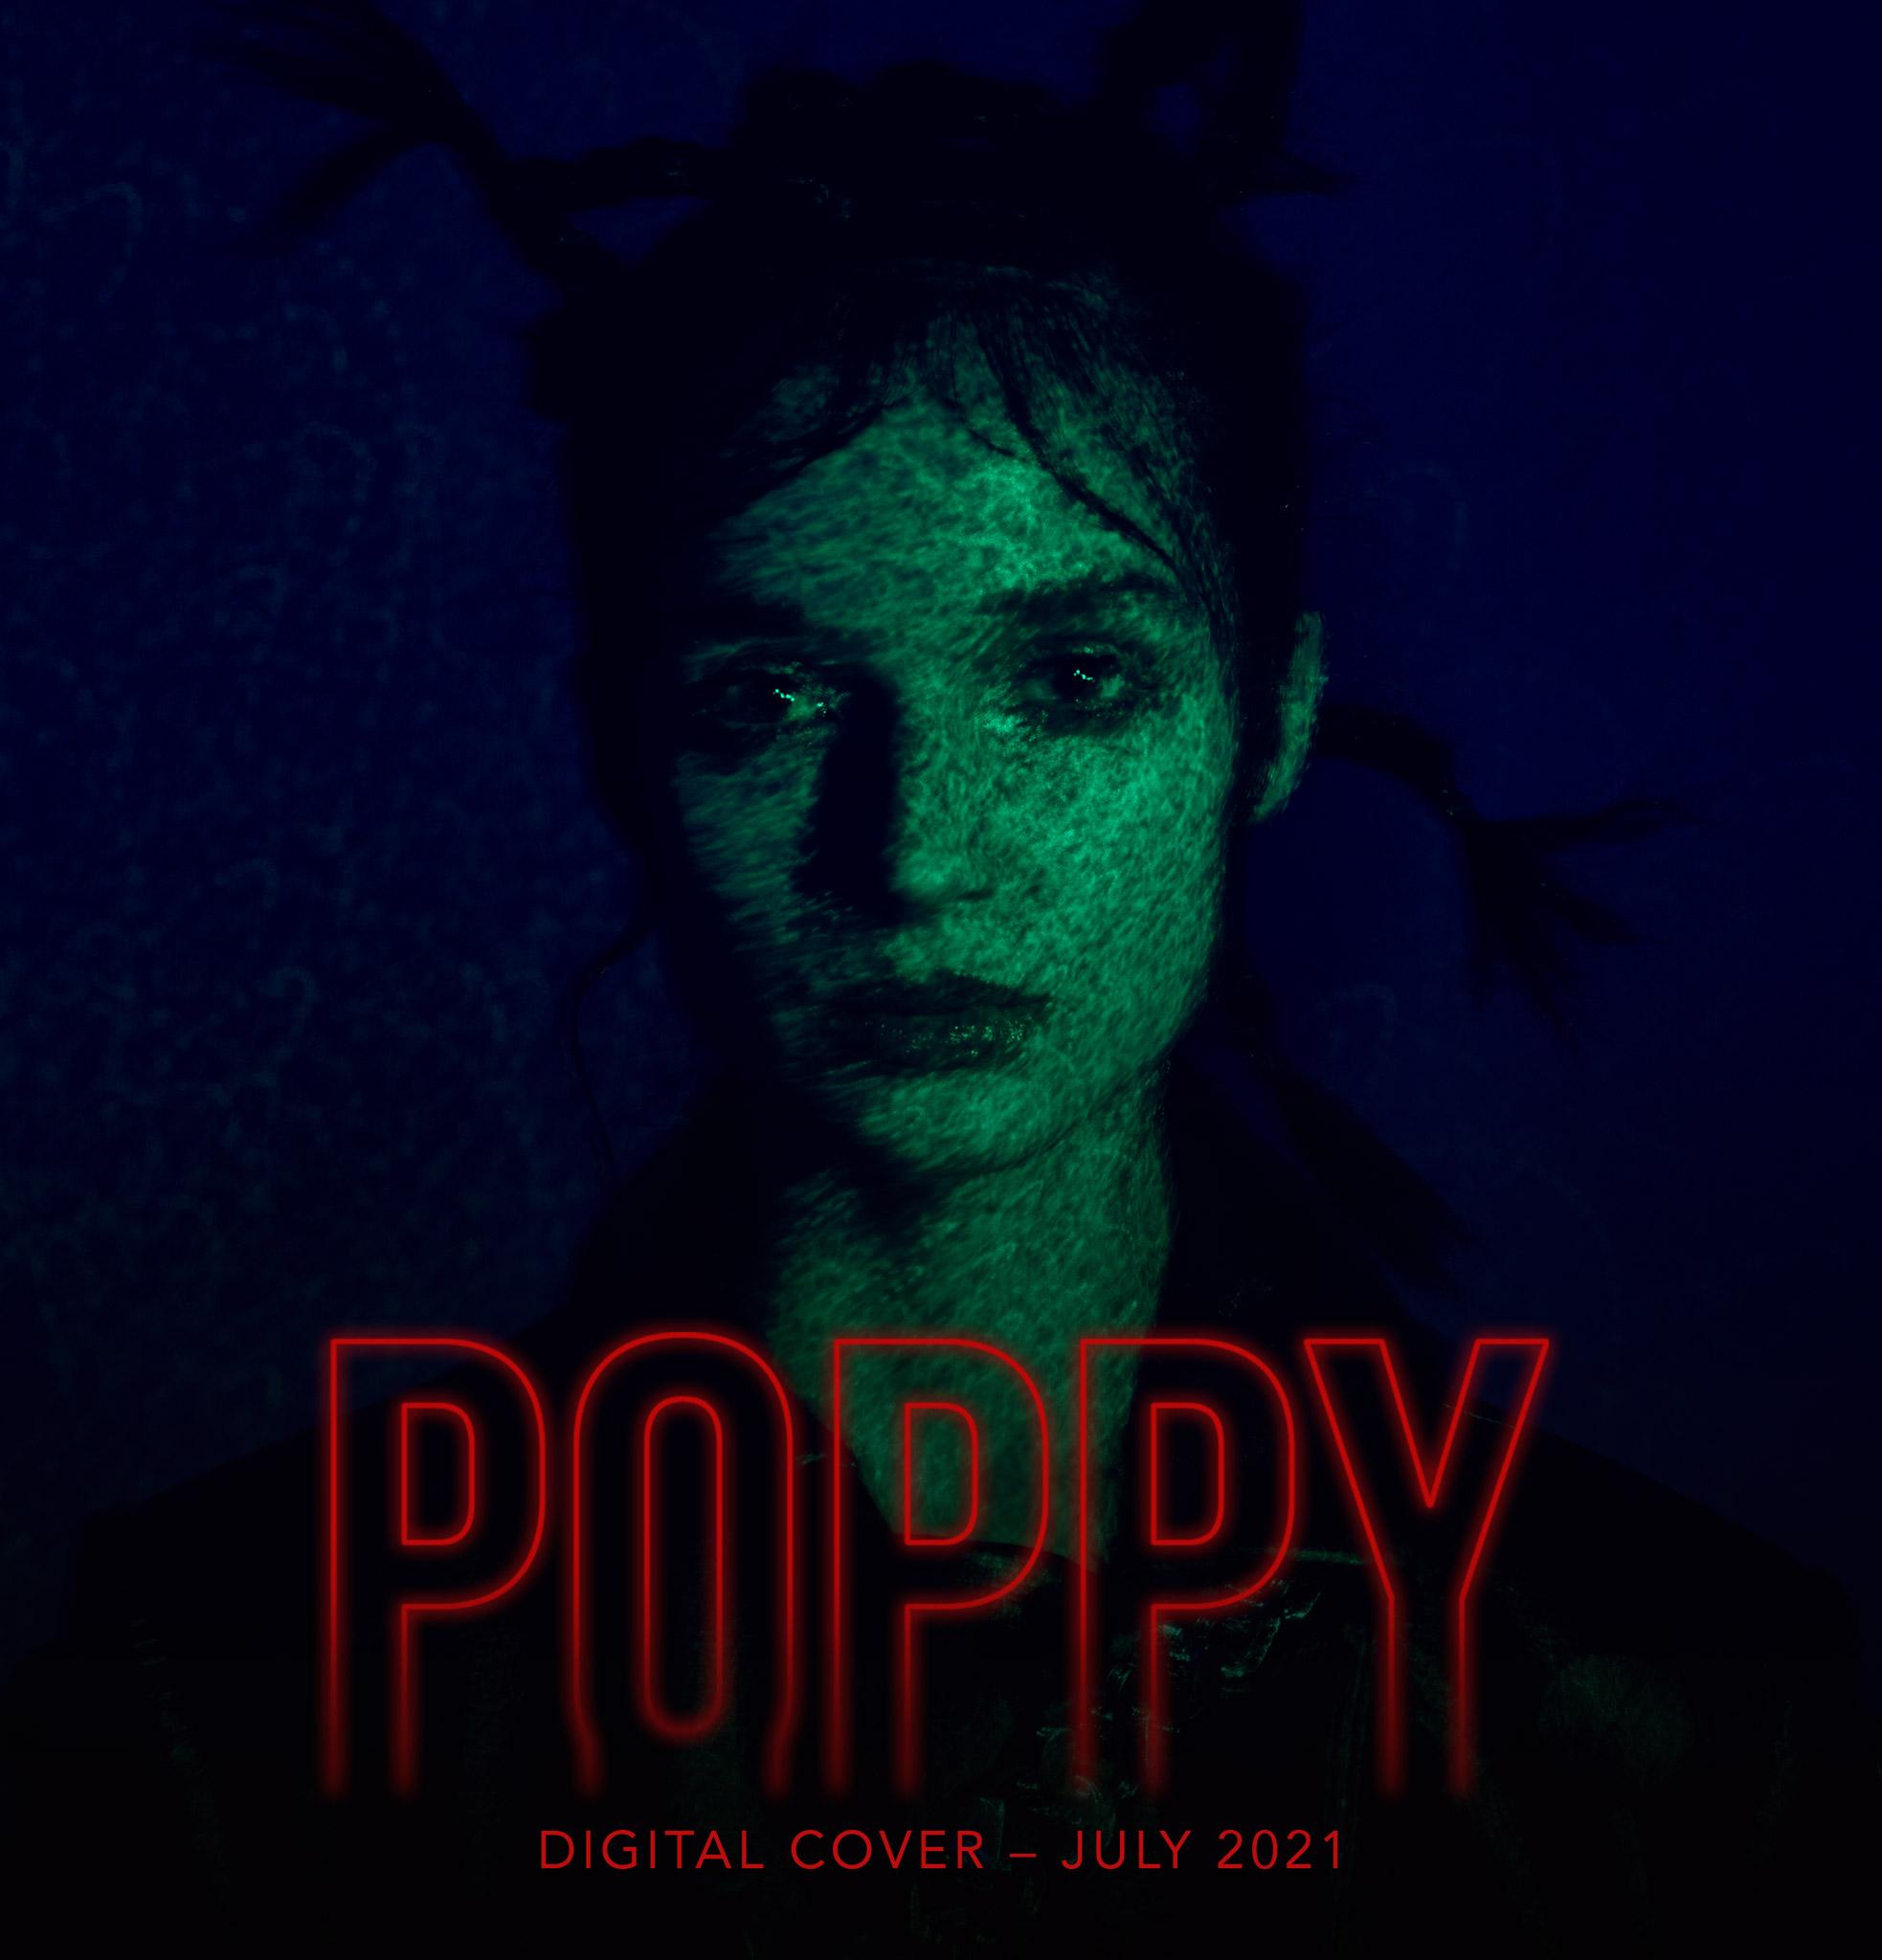 Poppy interview